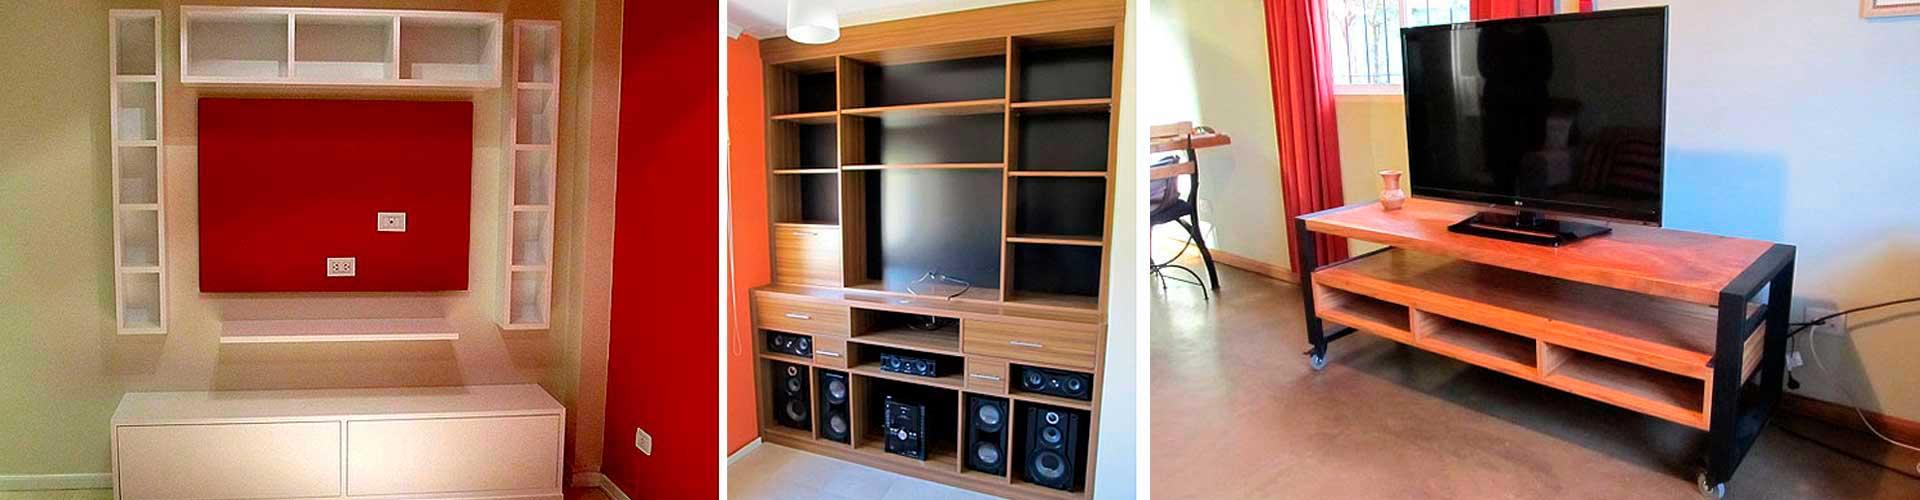 Fabrica de Muebles para Living LCD 32 42 Zona Oeste Norte a Medida